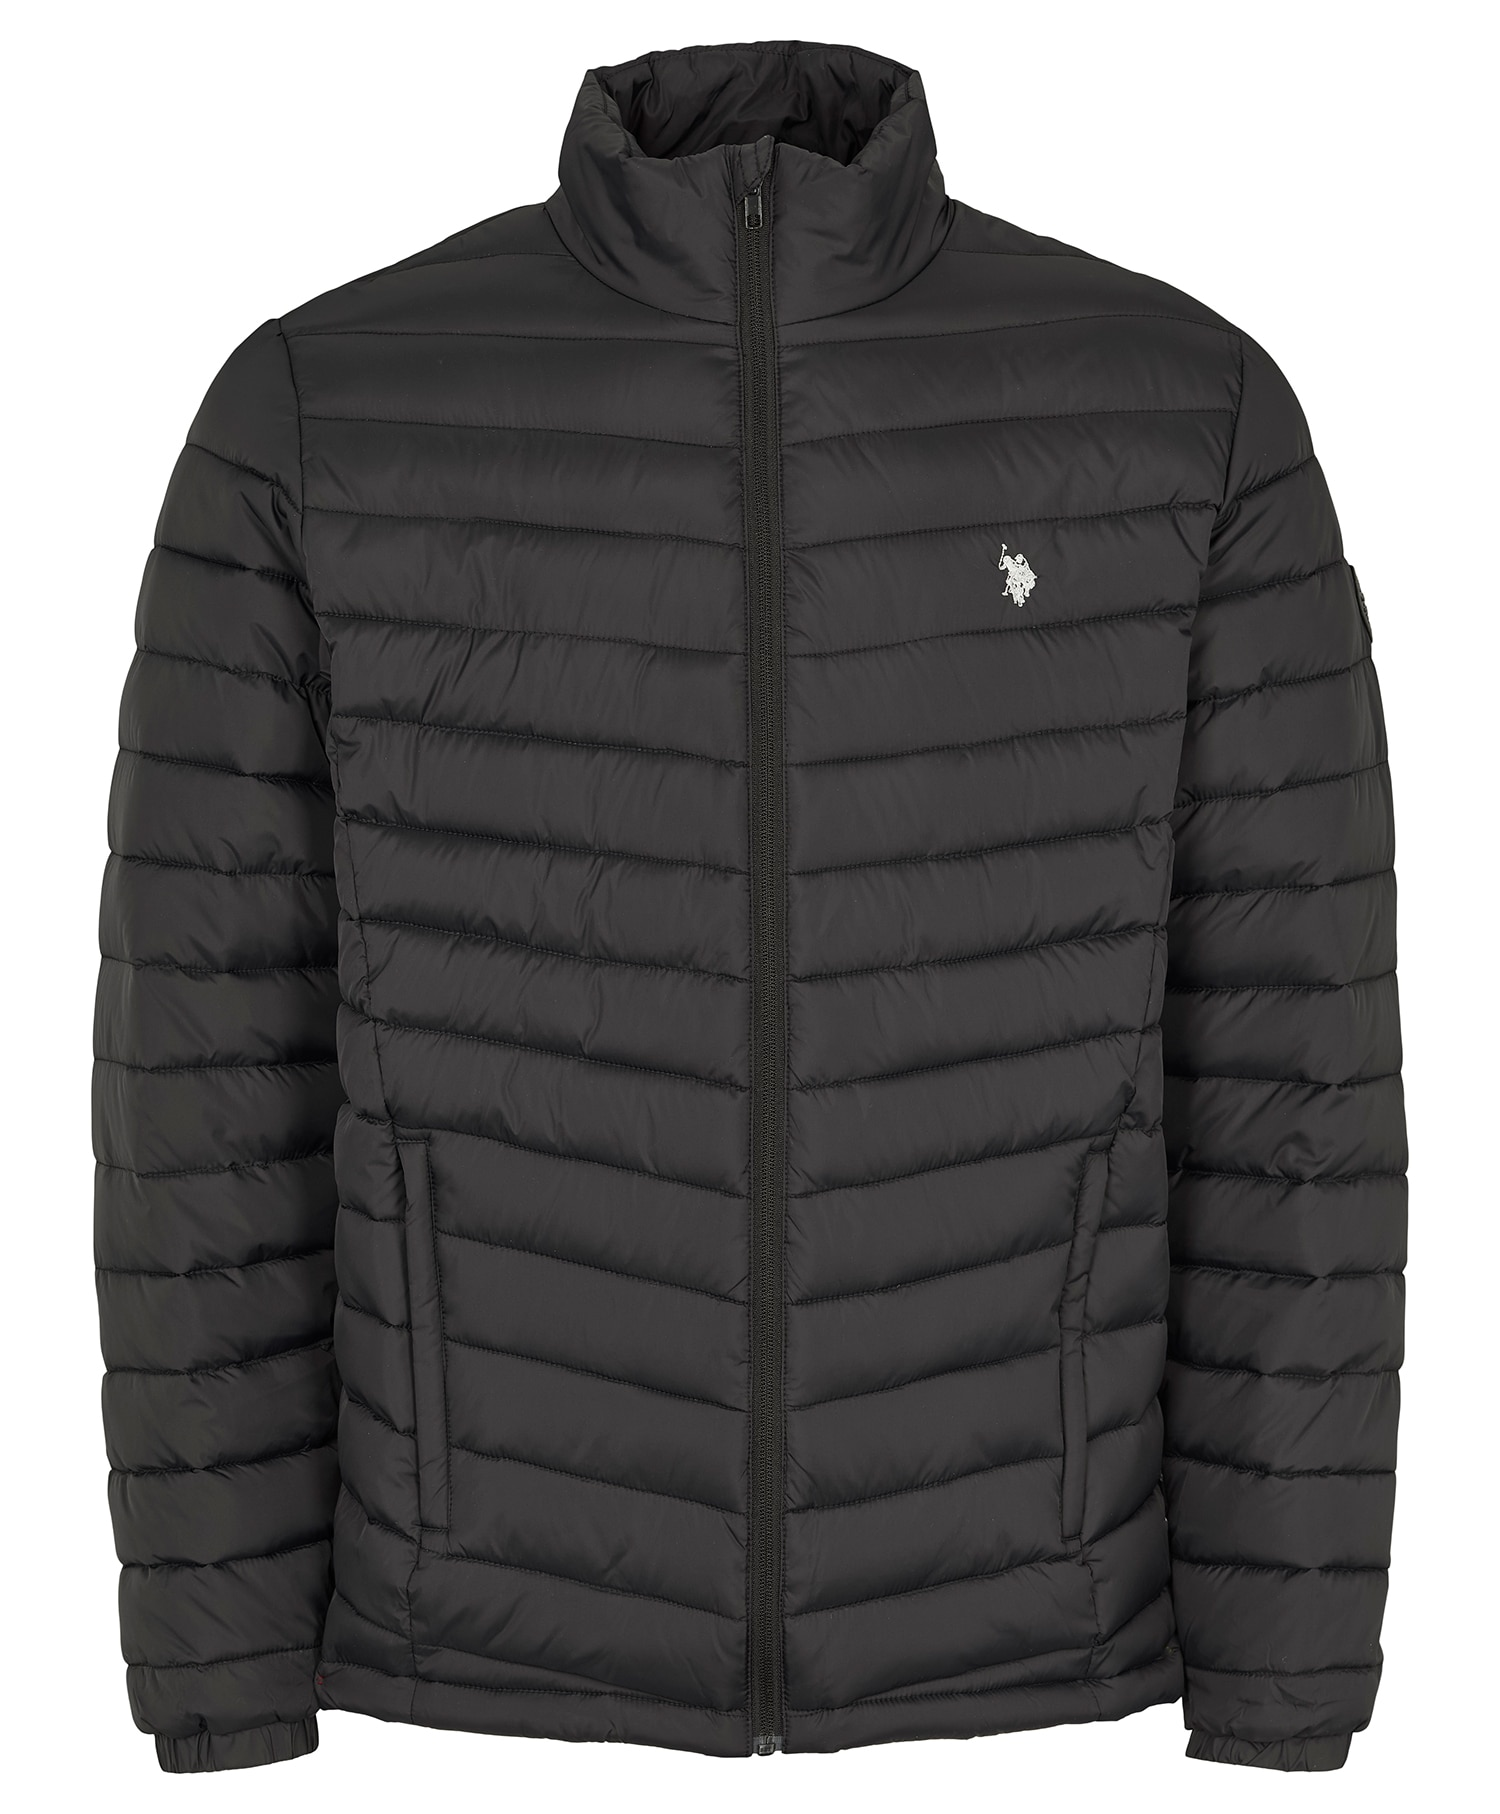 U.S Polo Chason Jacket